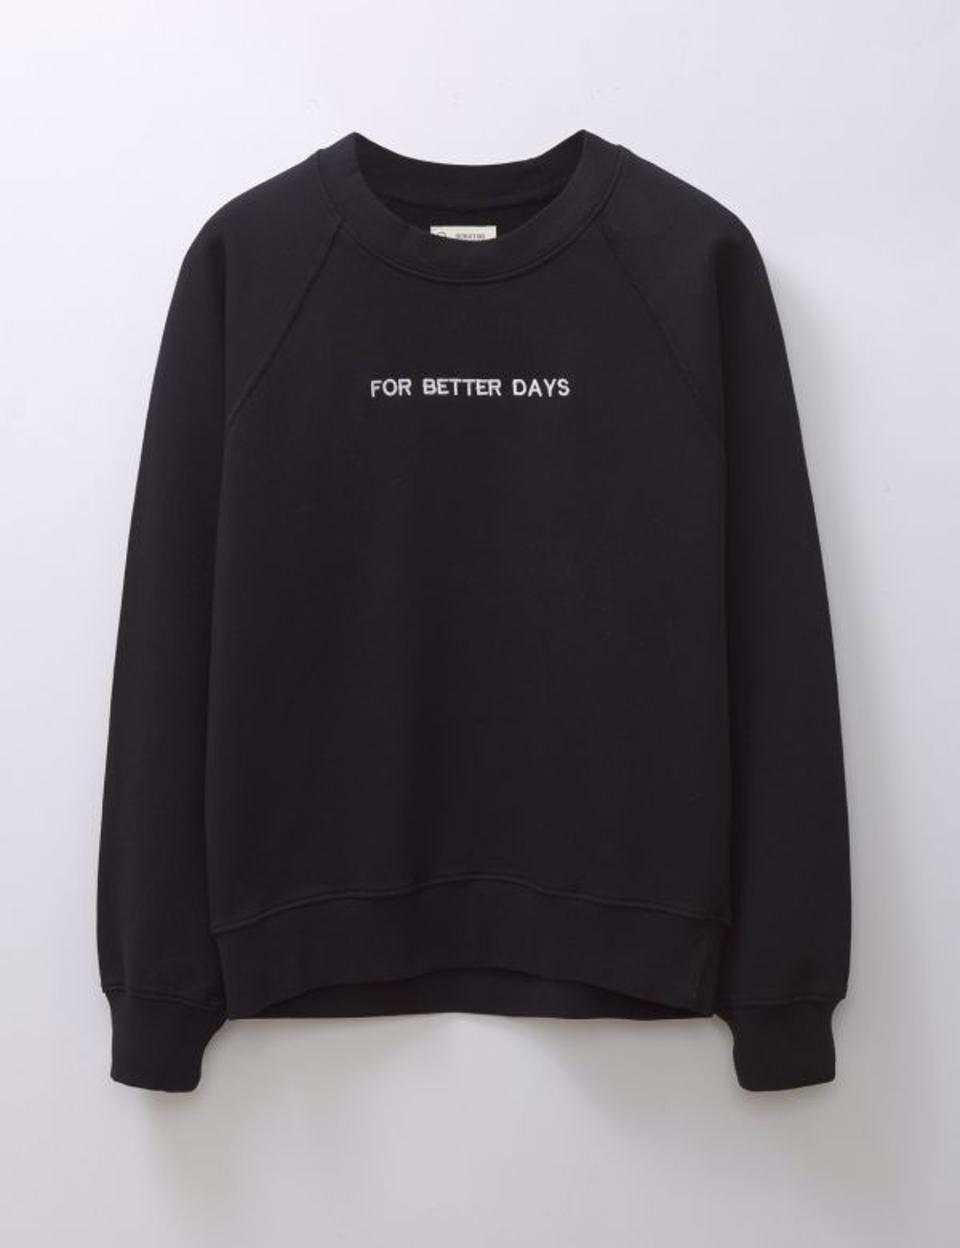 For Better Days sweatshirt